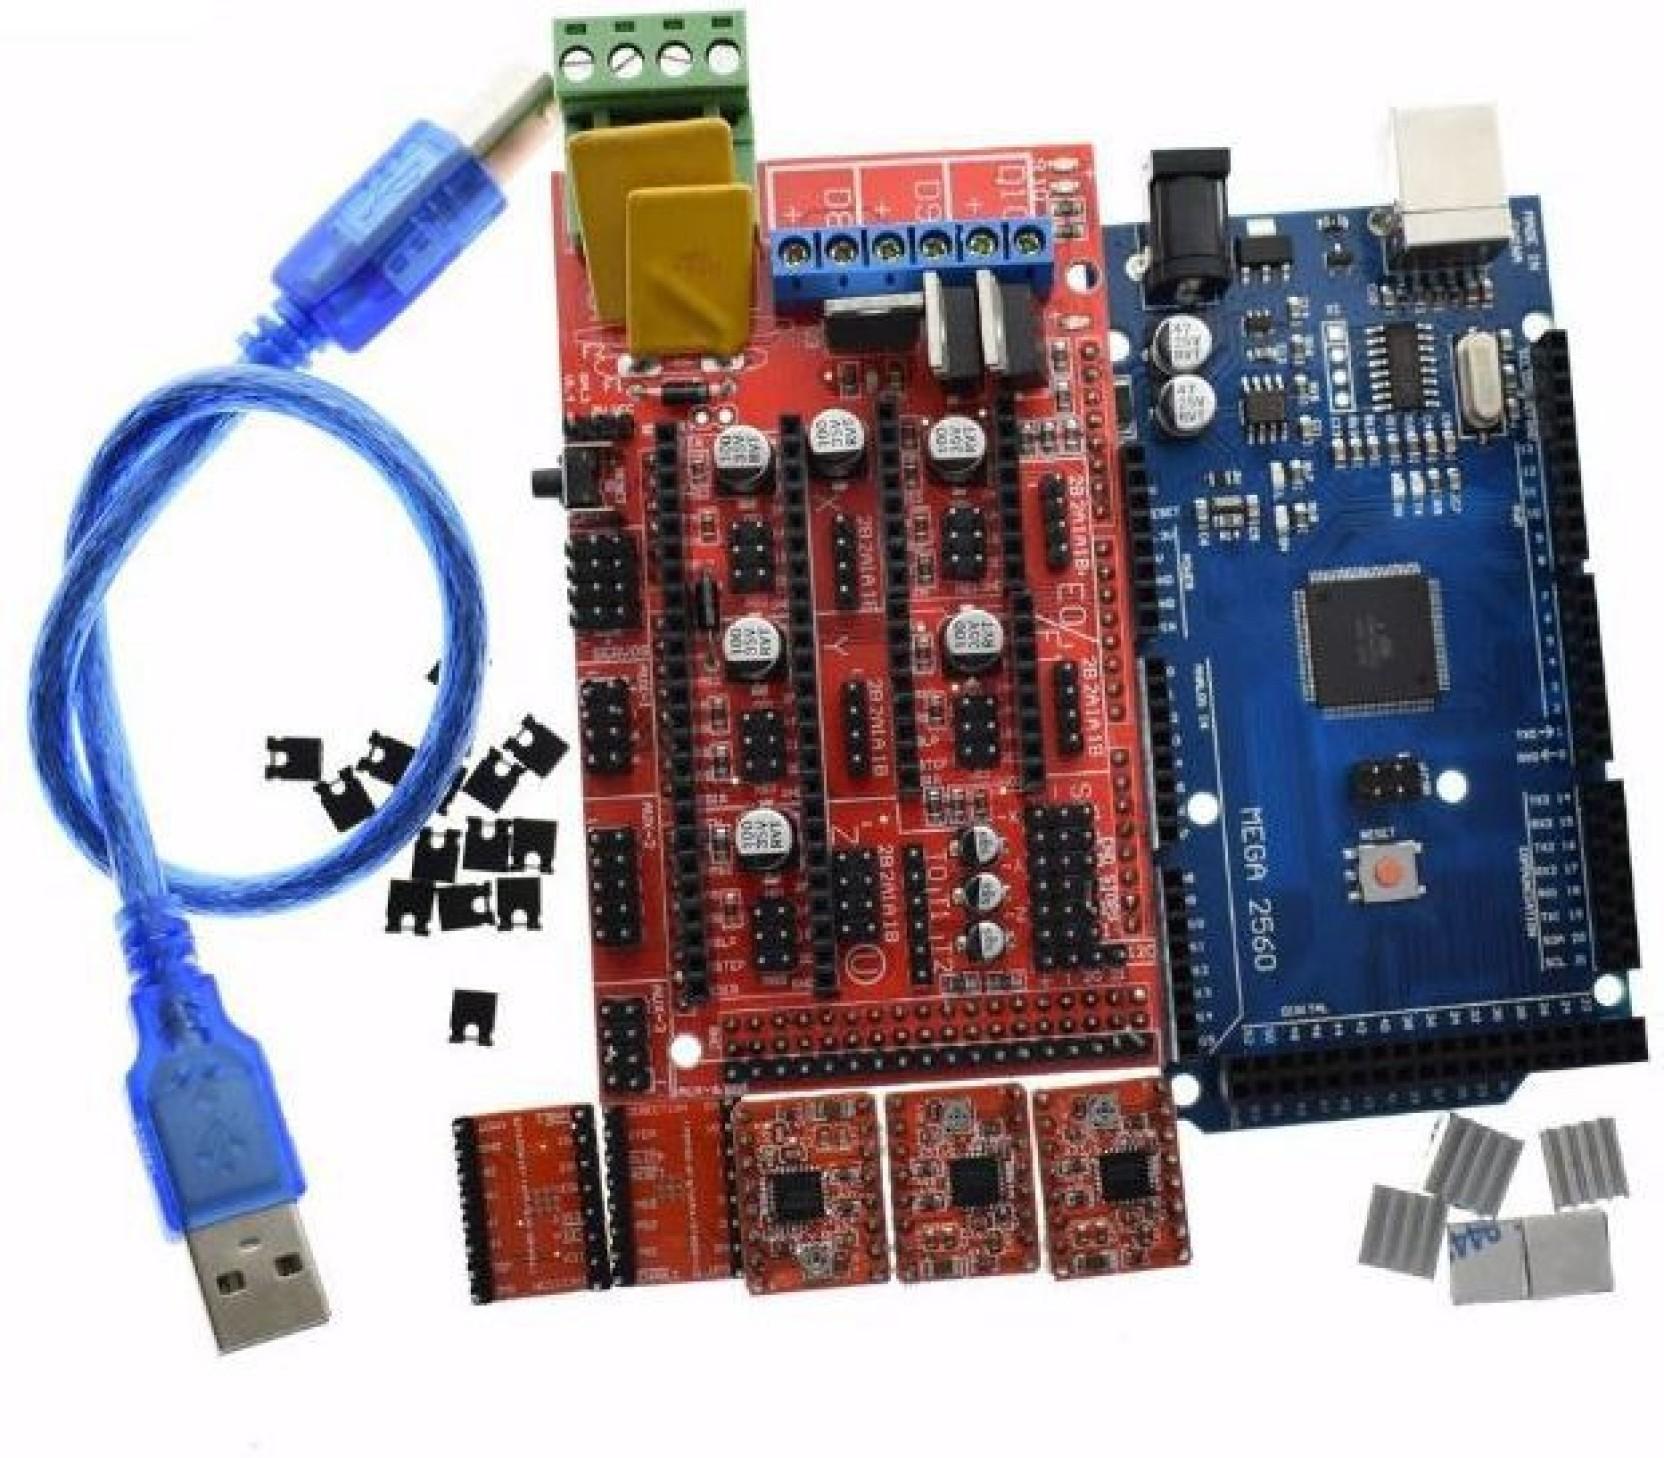 Technologybazar Ramps 14 Arduino Mega 2560 5pcs A4988 For Arduin Home